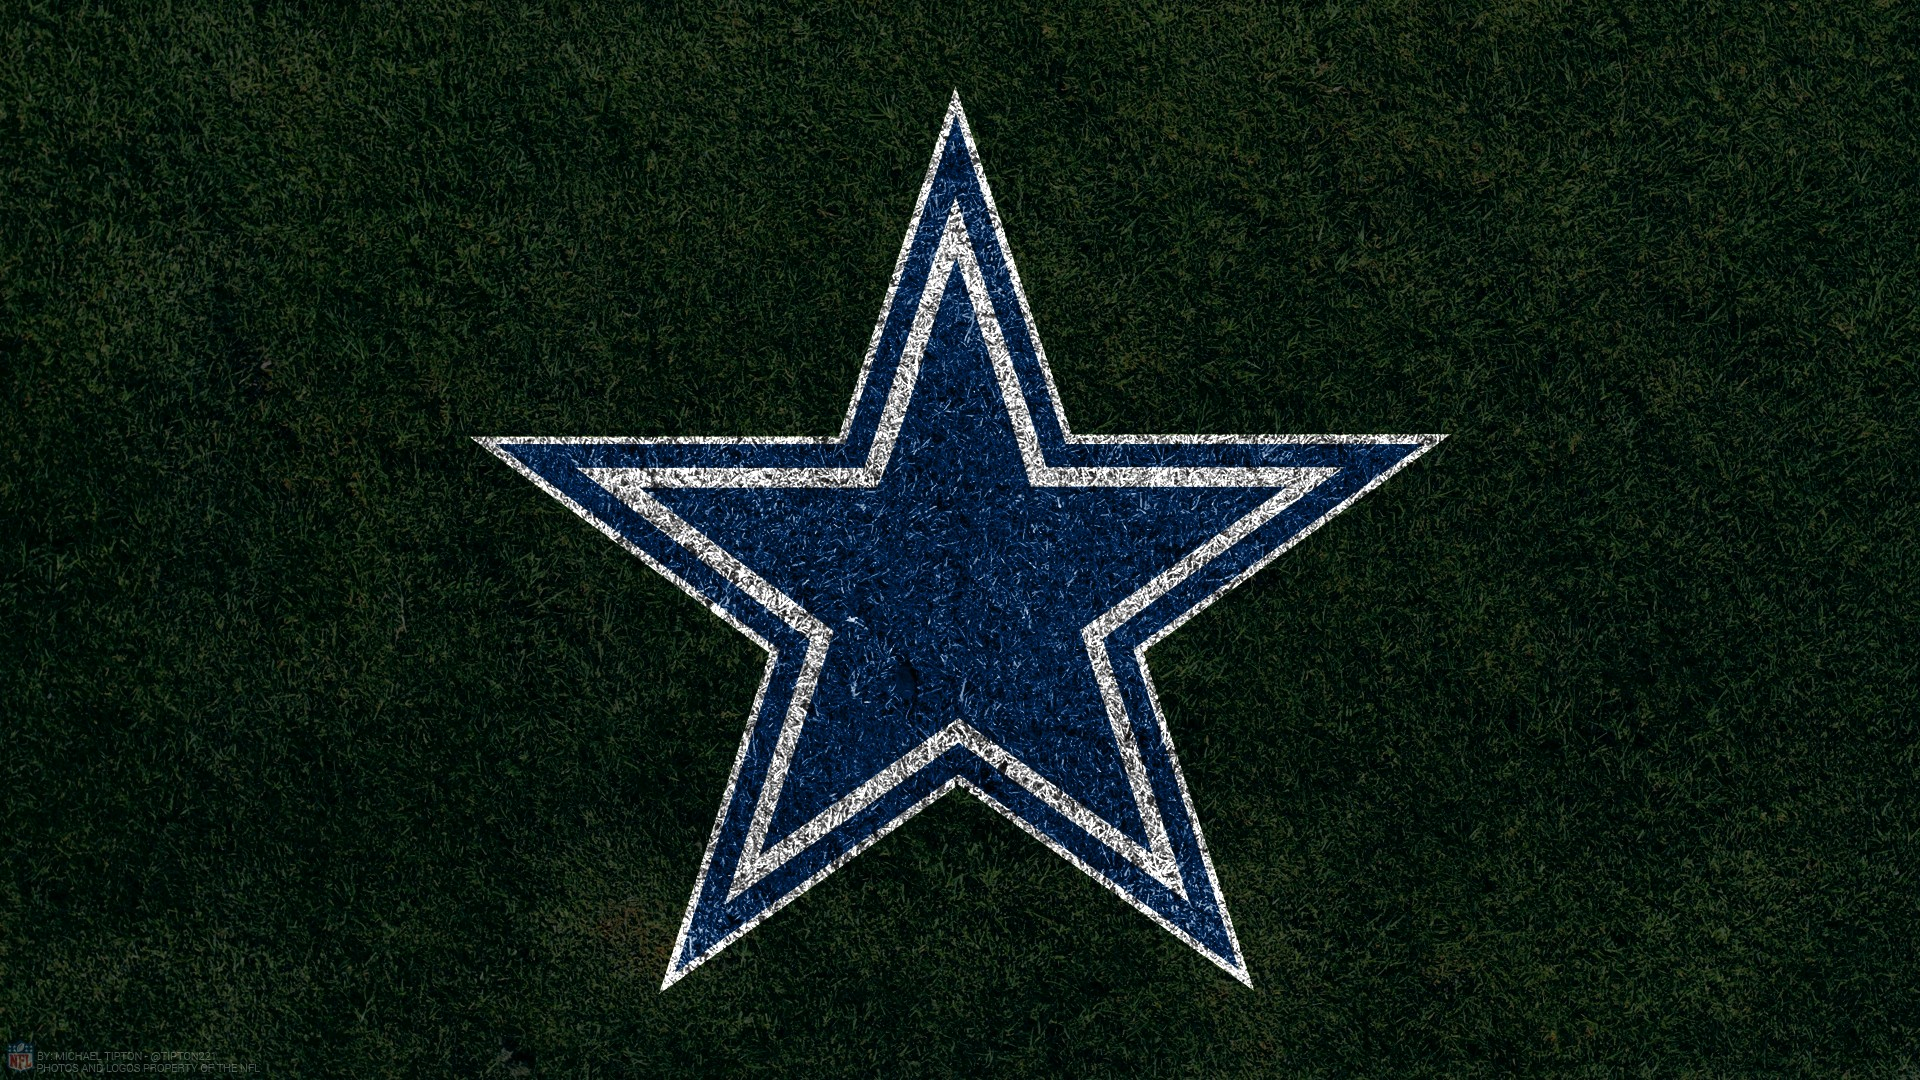 Dallas Cowboys wallpaper ·① Download free cool full HD ...